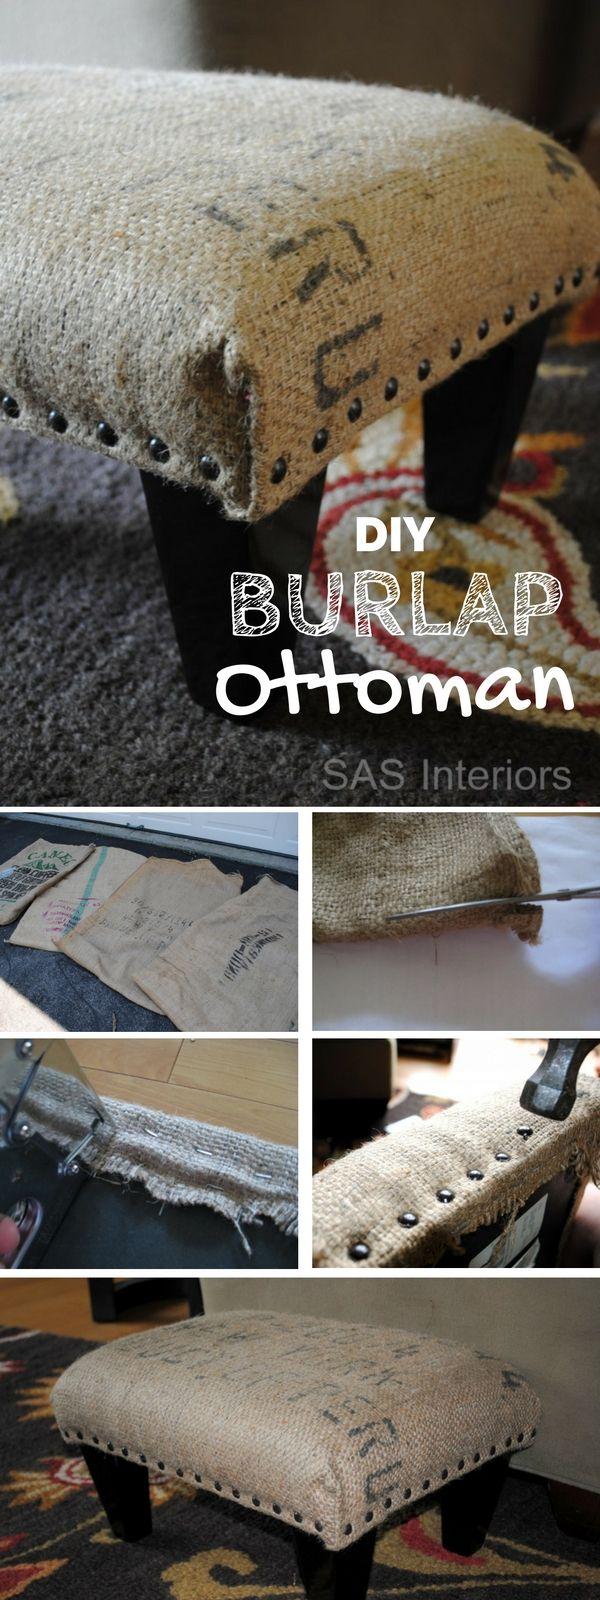 Make an easy DIY ottoman using burlap coffee sack @istandarddesign